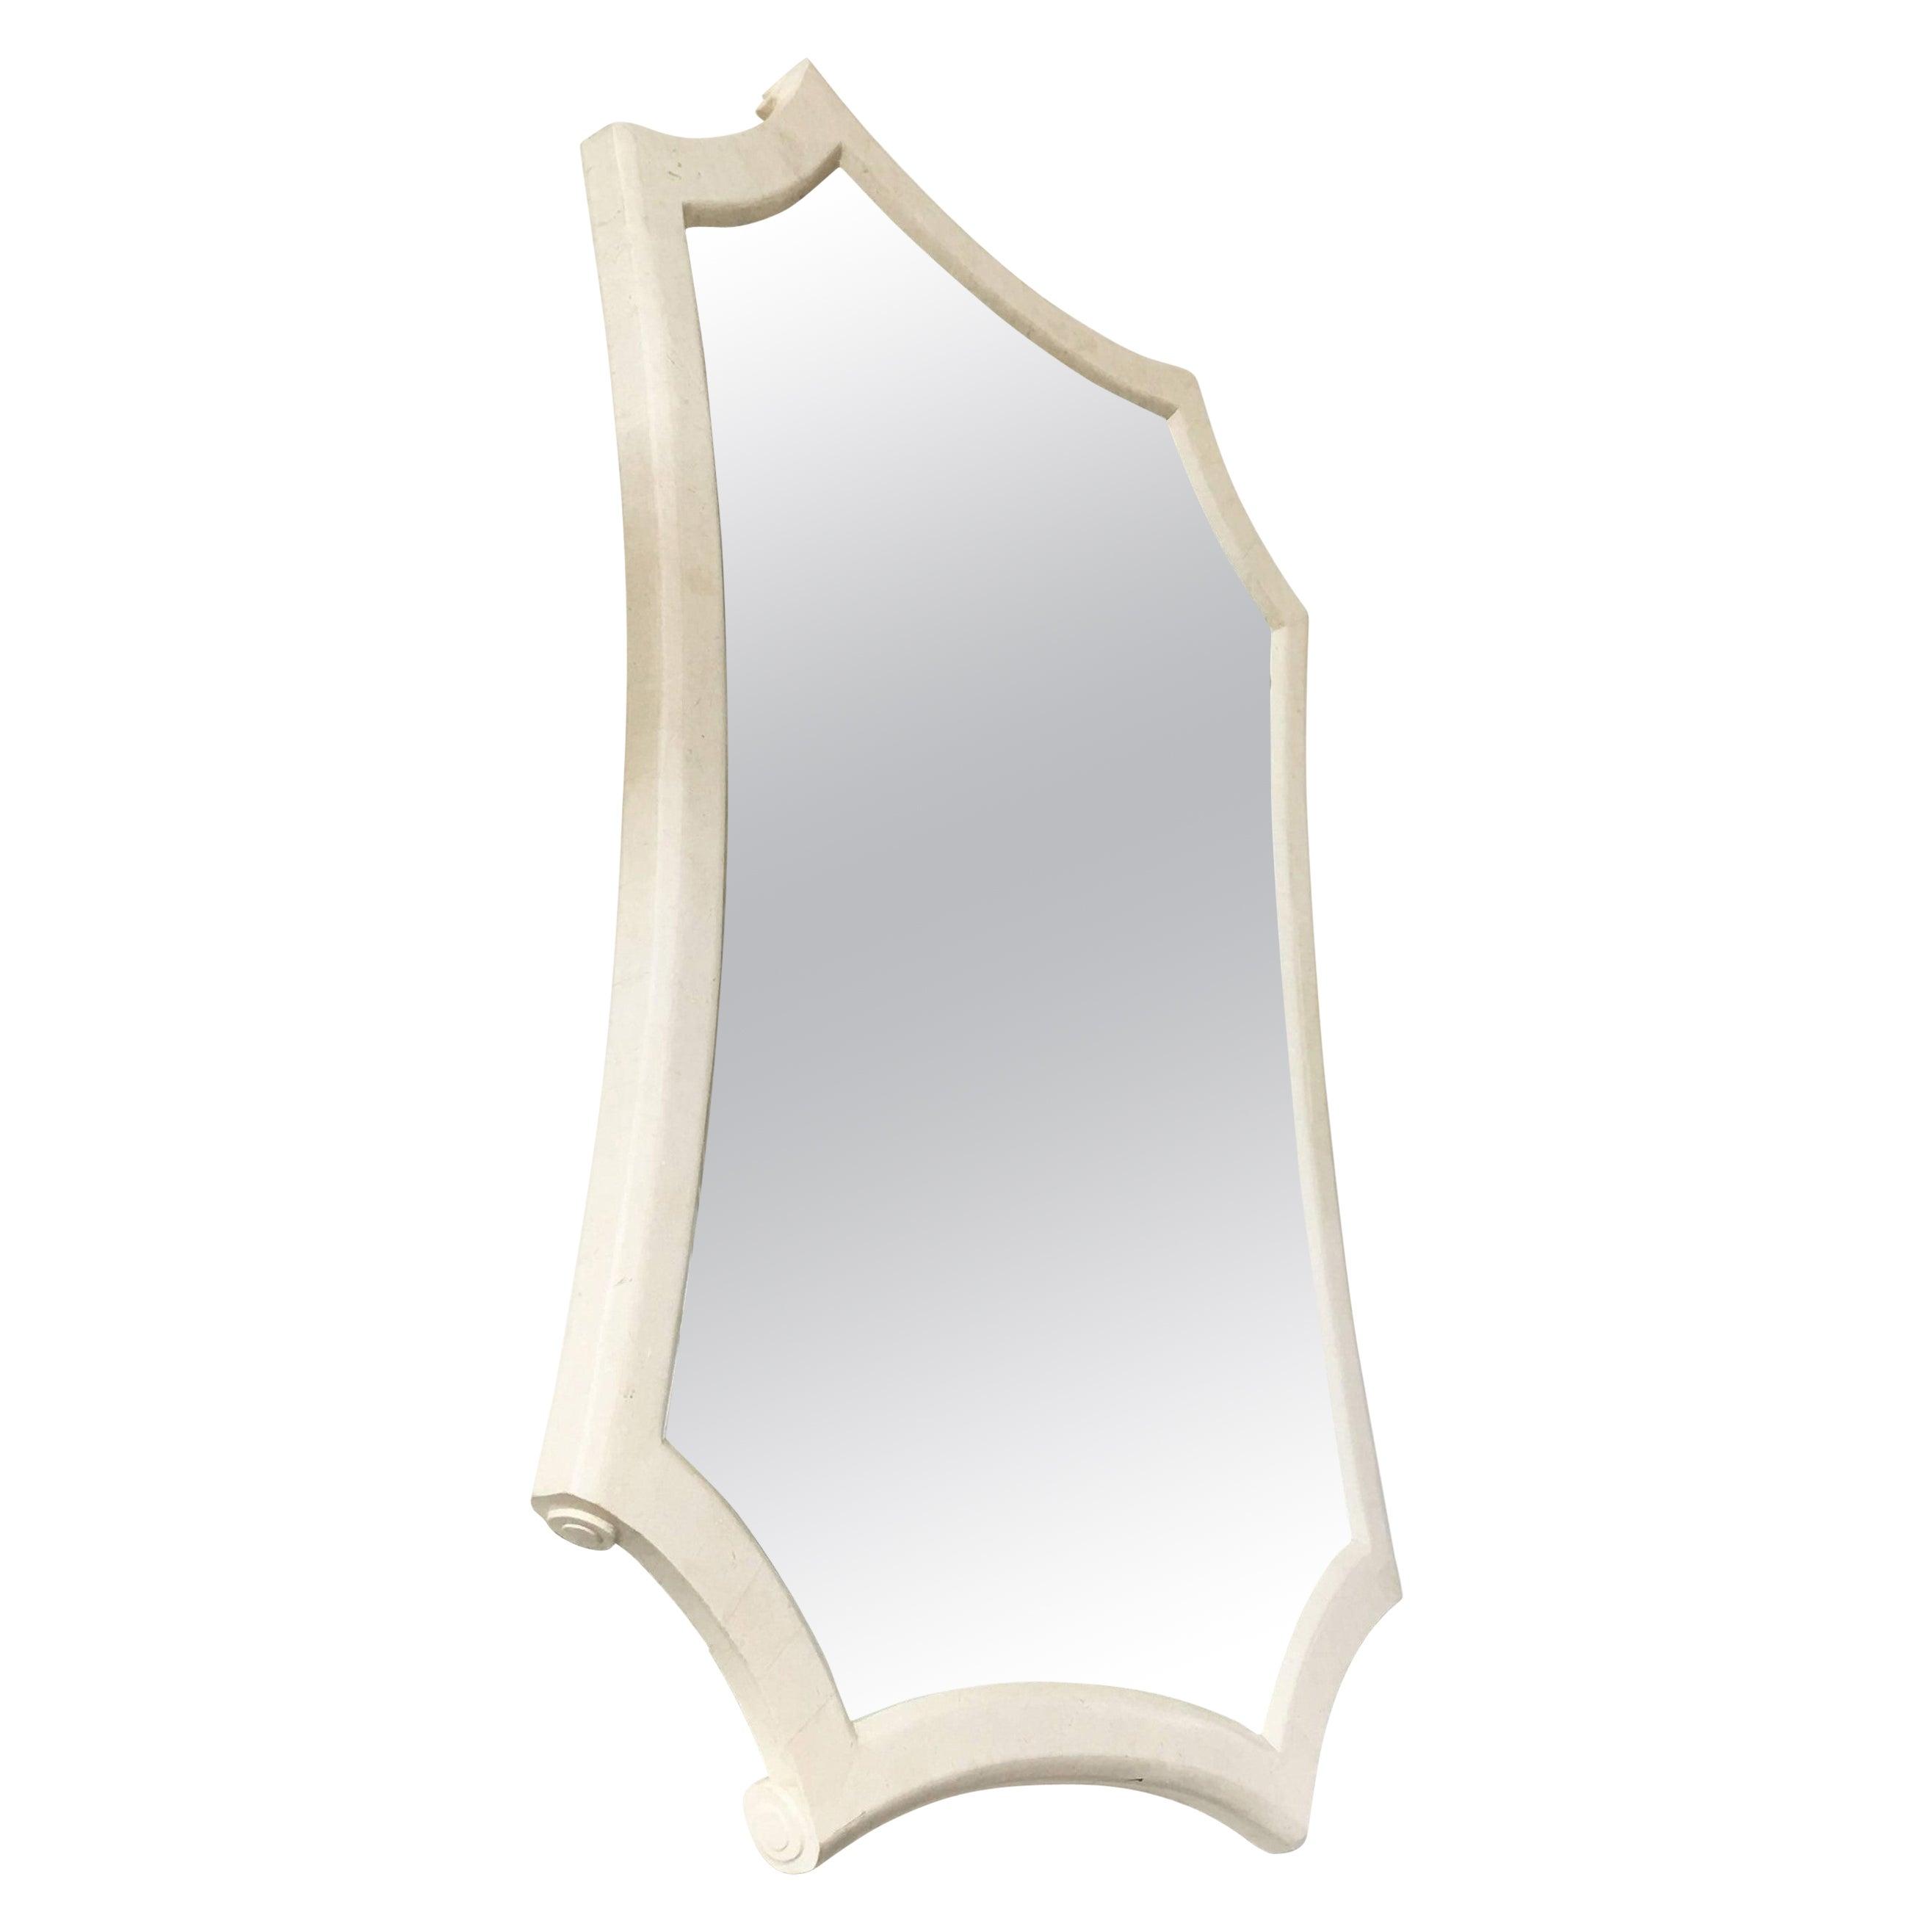 Maitland Smith White Tessellated Marble Mirror